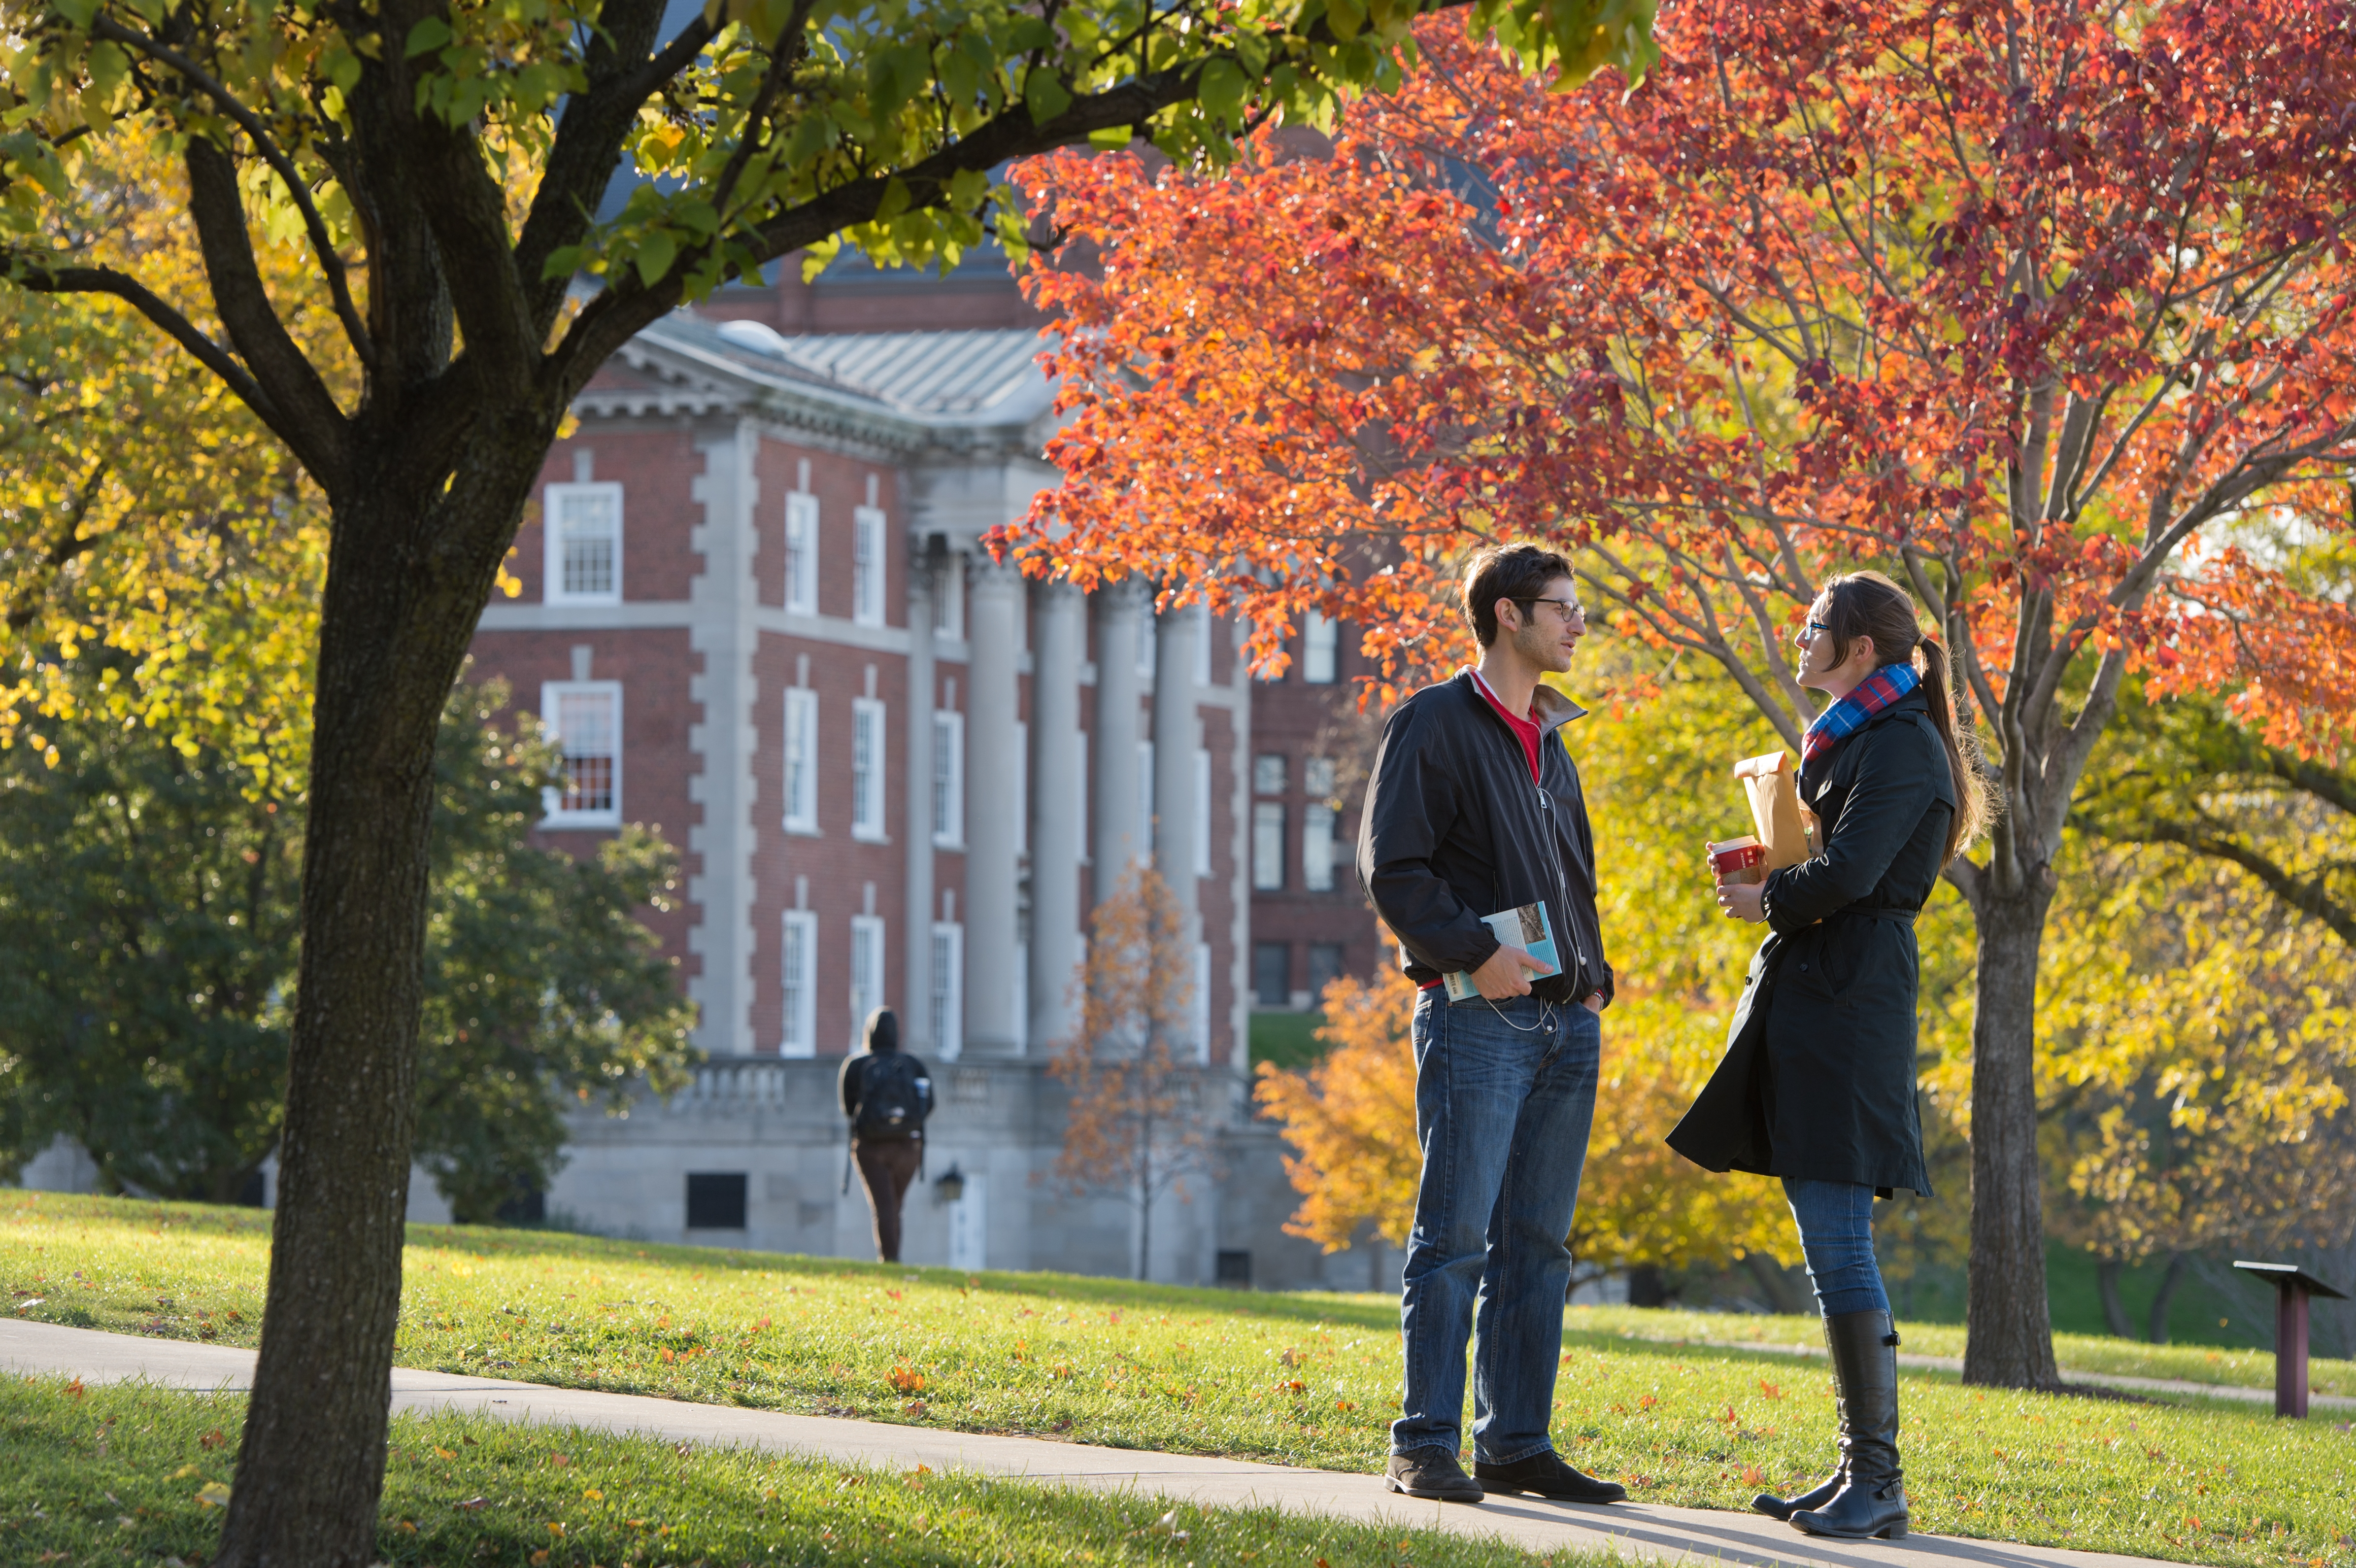 Campus Scenes Fall Students Talking Walking